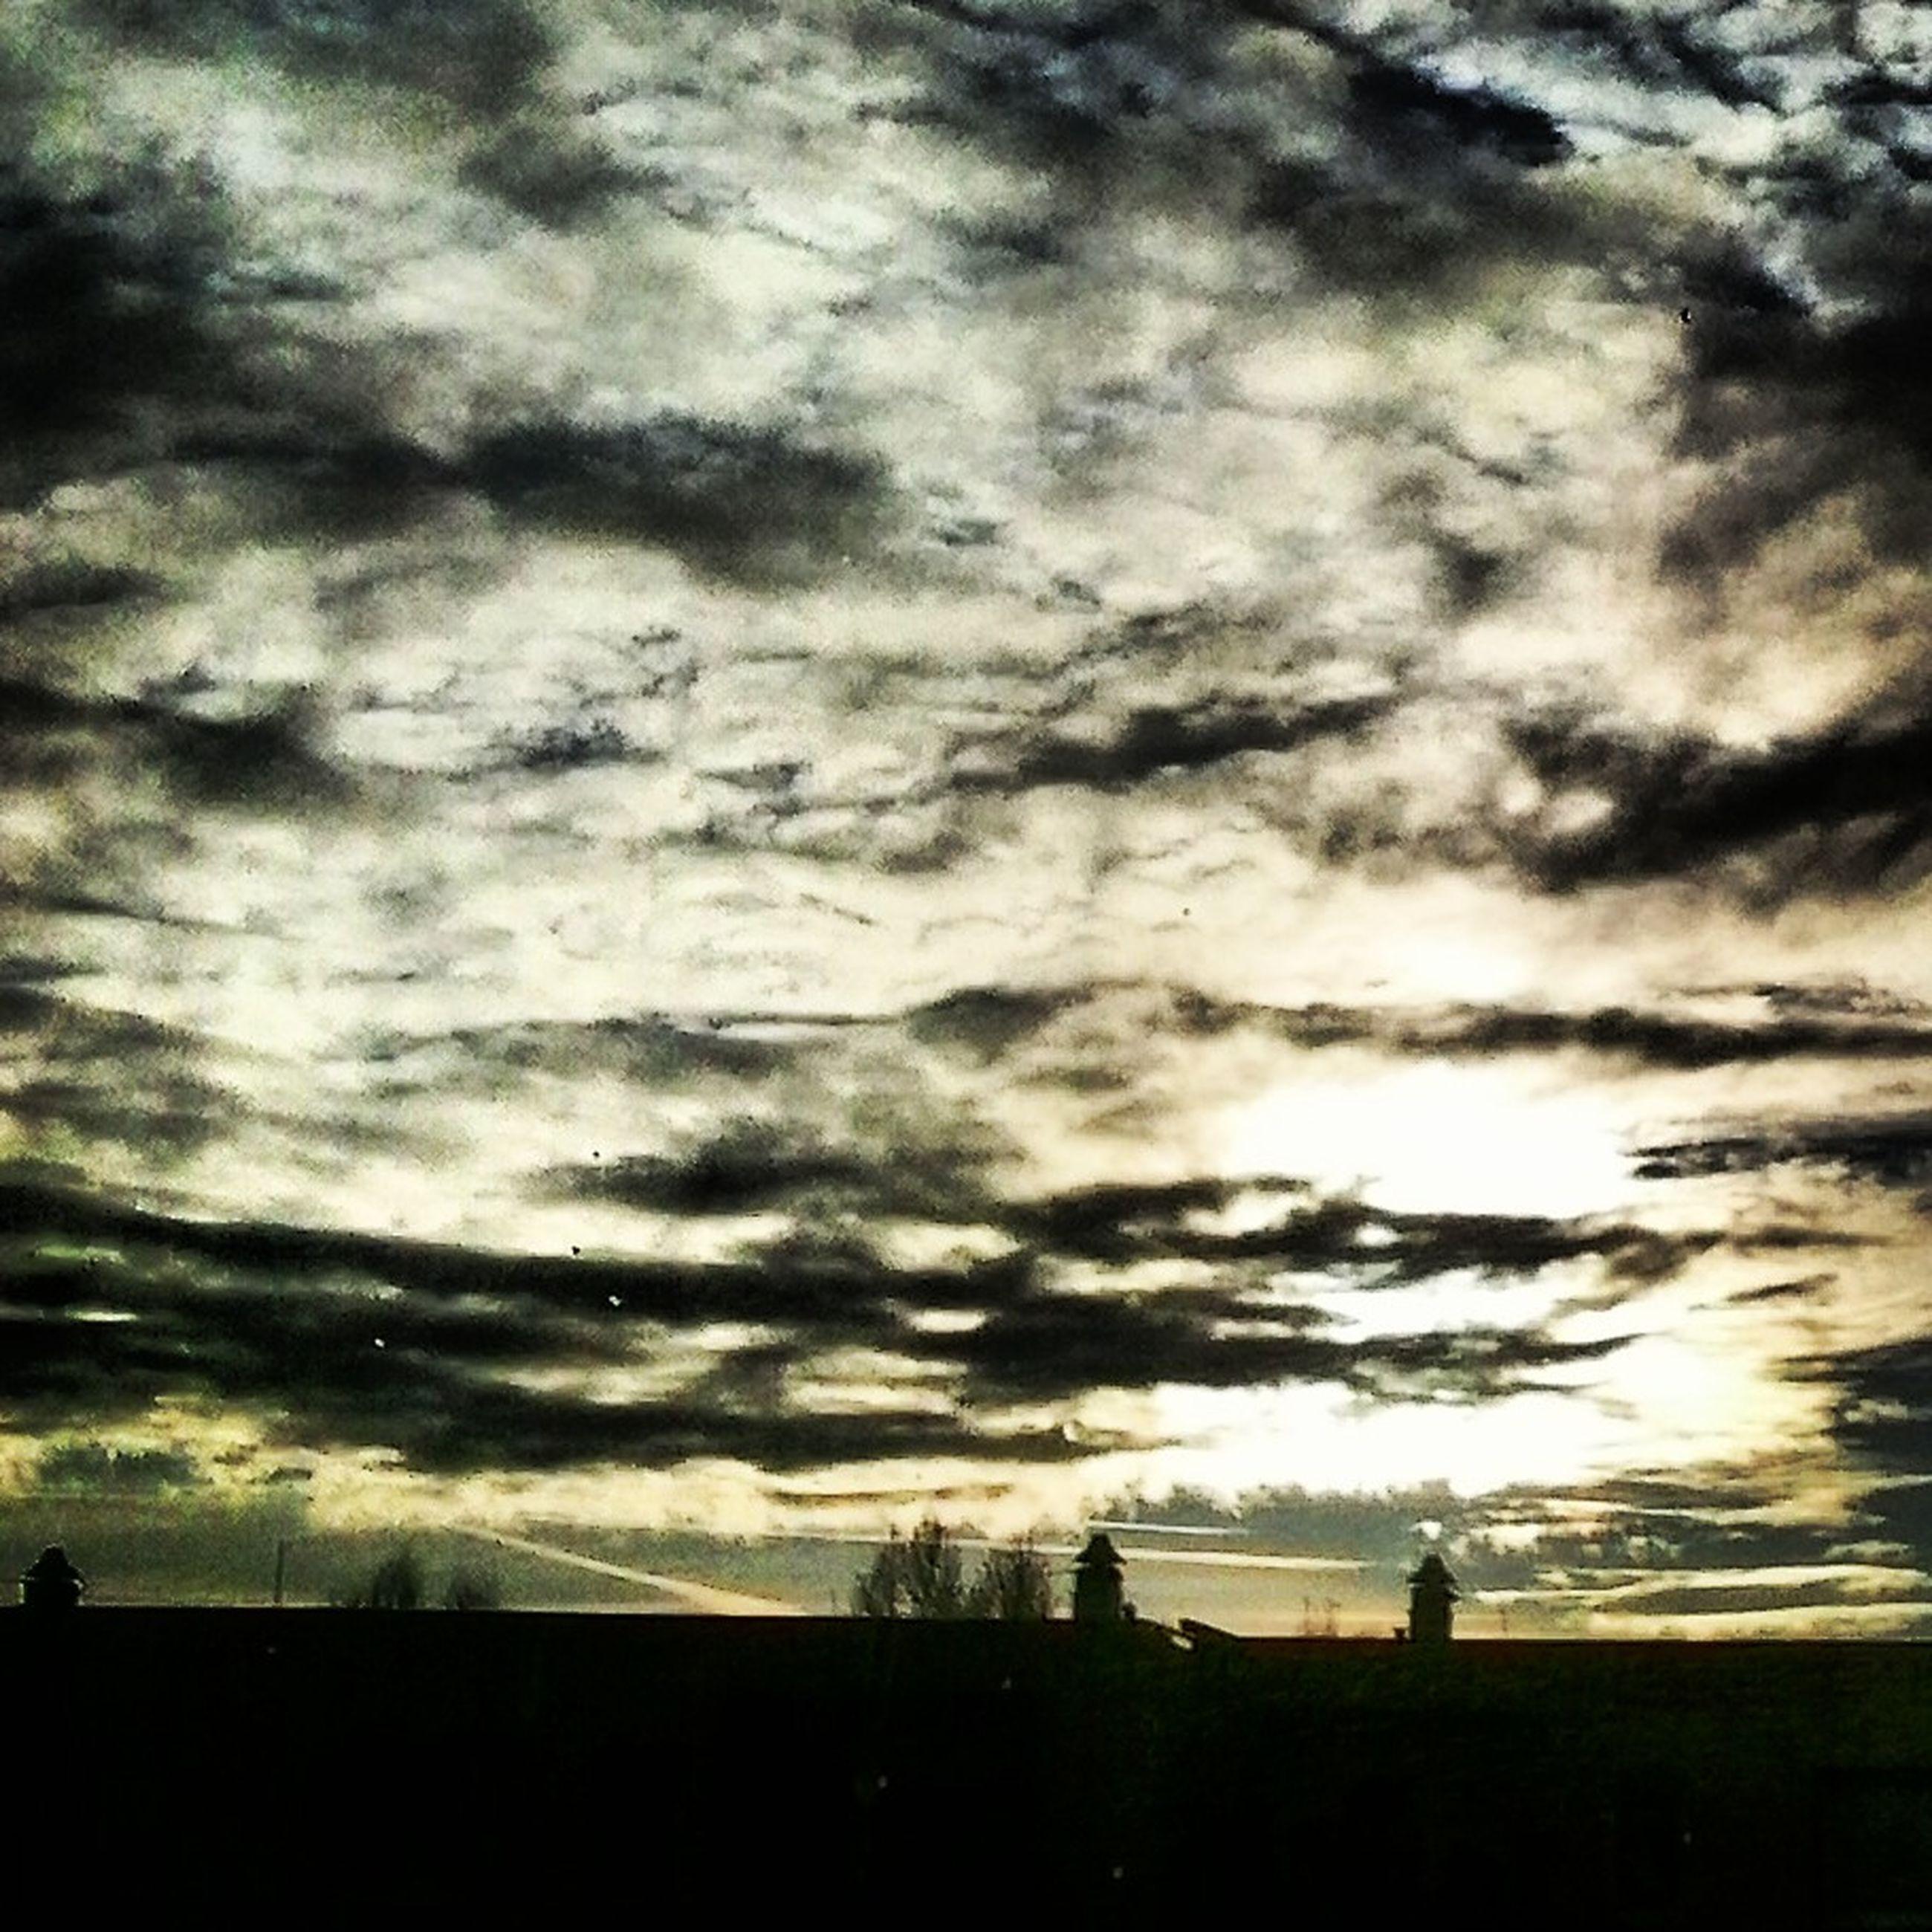 sky, cloud - sky, silhouette, cloudy, weather, sunset, beauty in nature, tranquil scene, scenics, overcast, tranquility, cloud, dramatic sky, storm cloud, nature, dusk, cloudscape, landscape, atmospheric mood, field